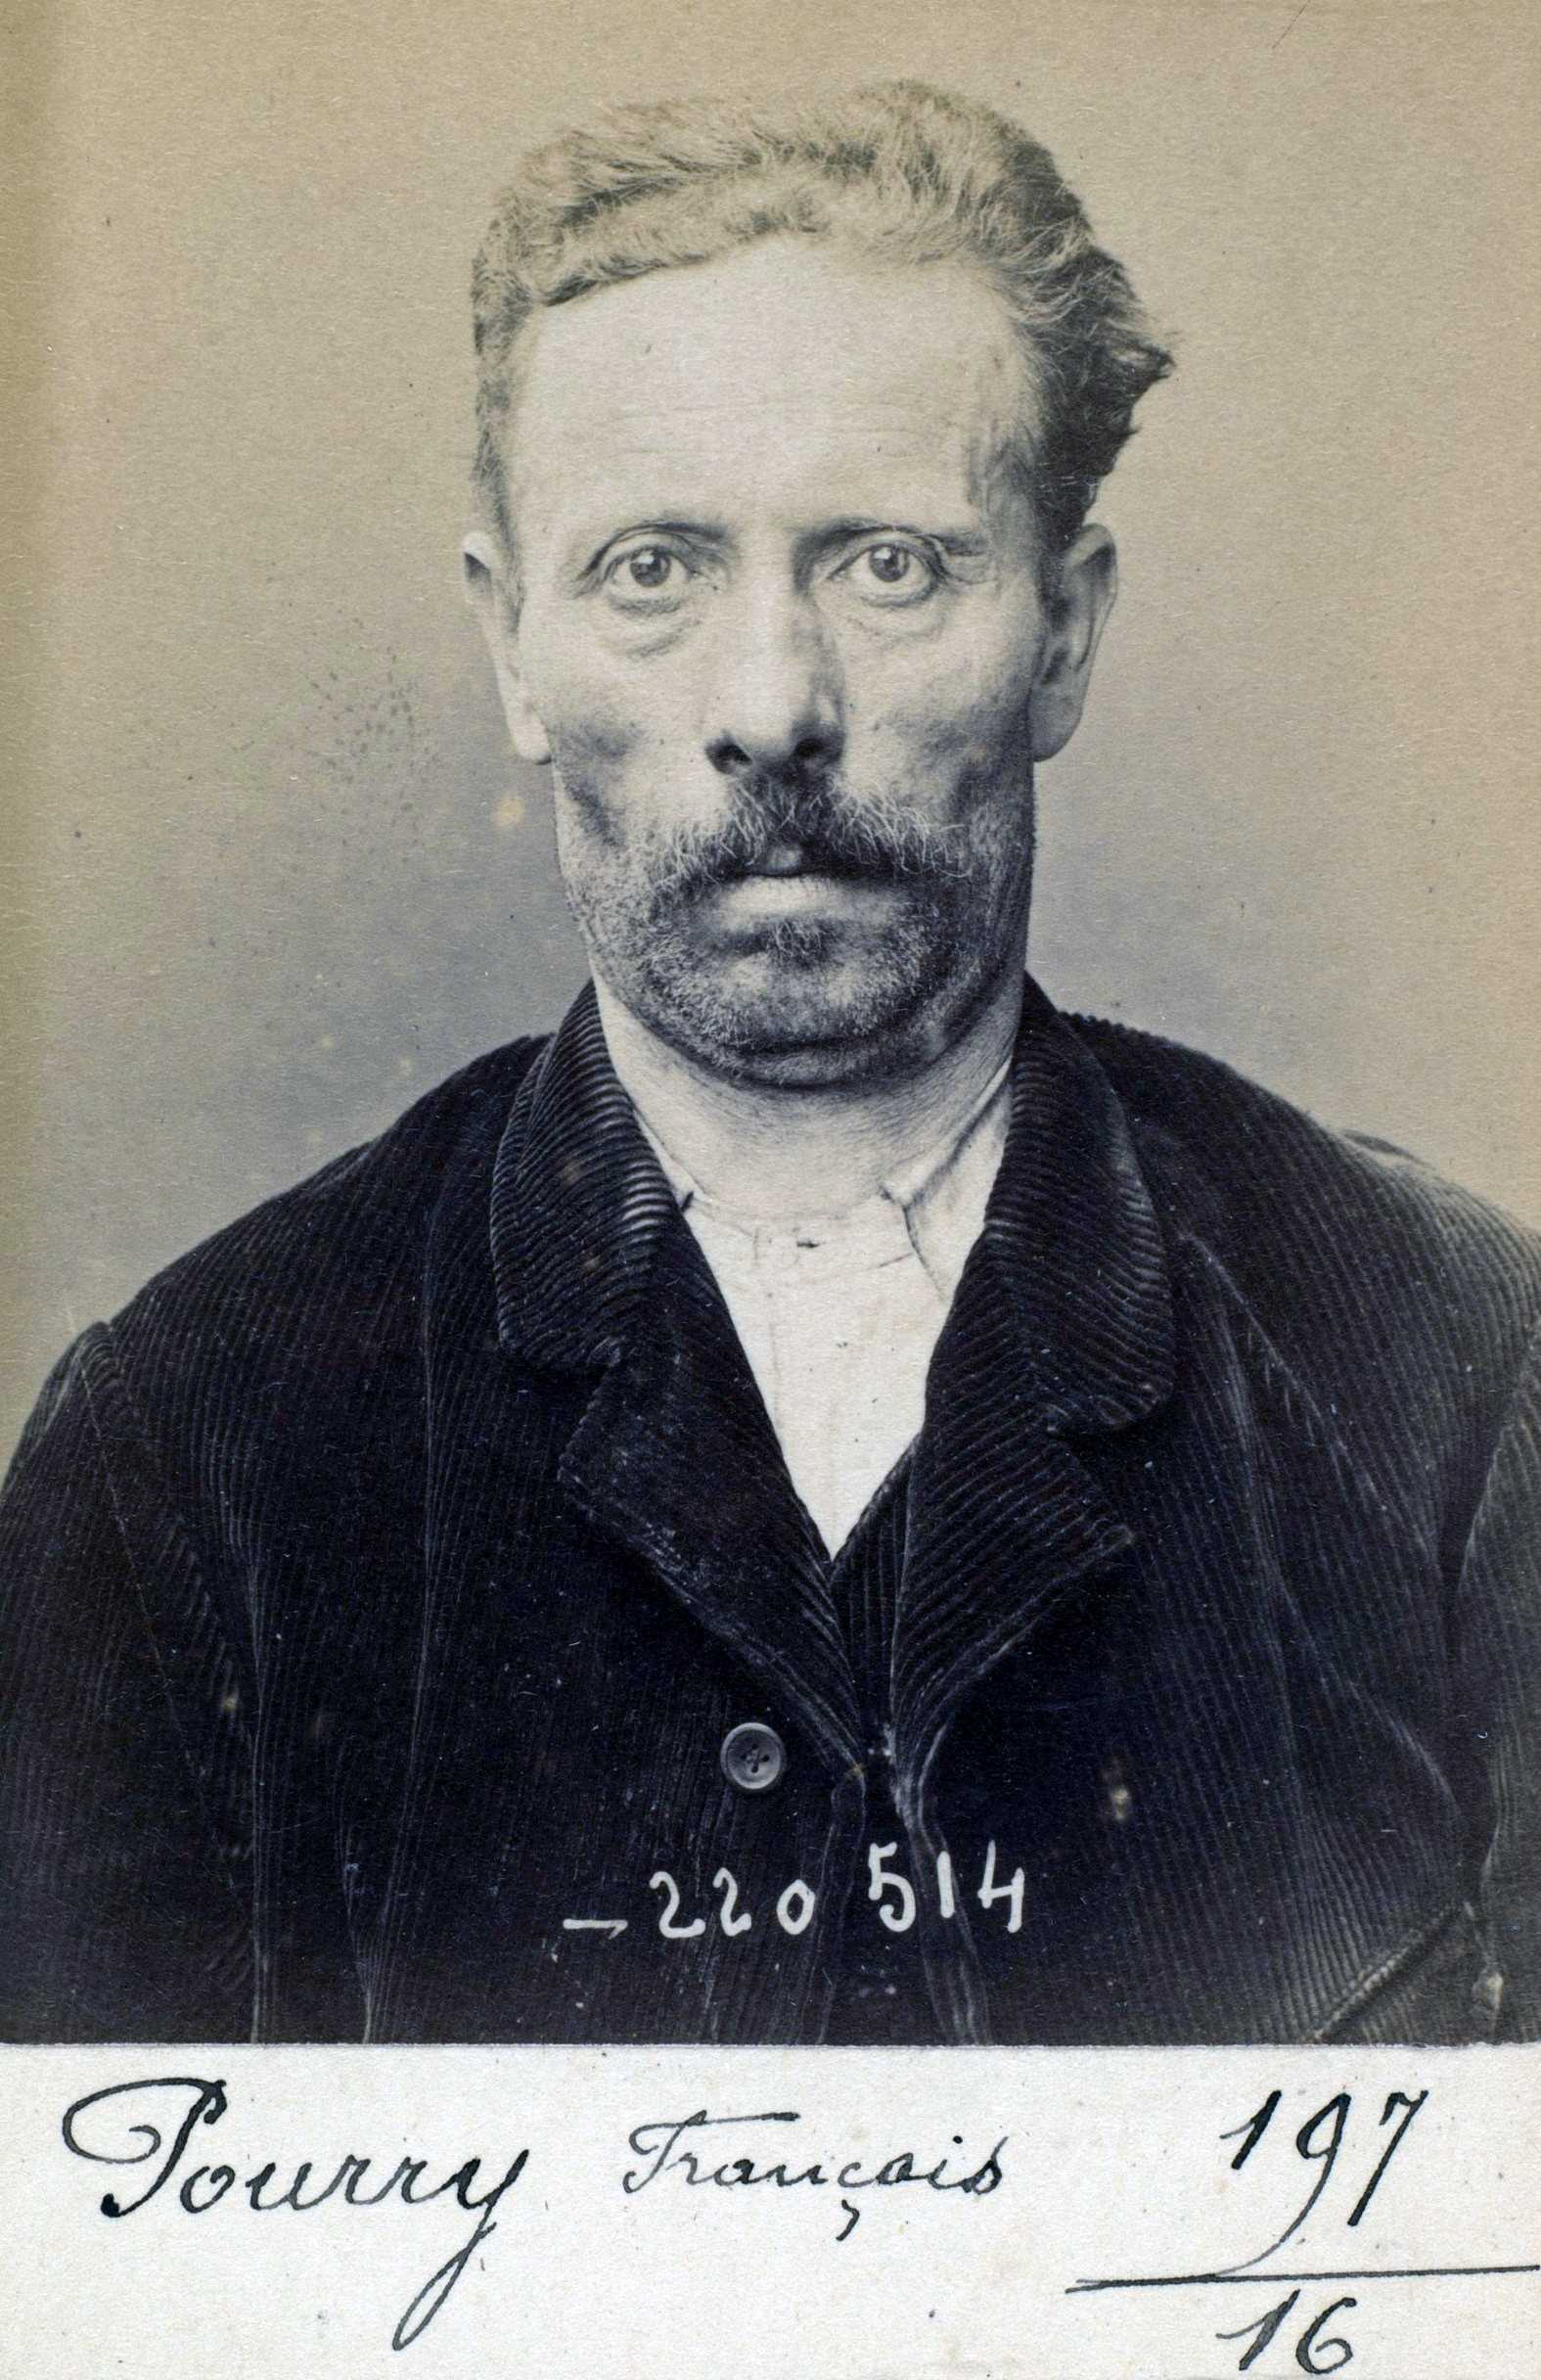 Foto policíaca de François Pourry (3 de juliol de 1894)